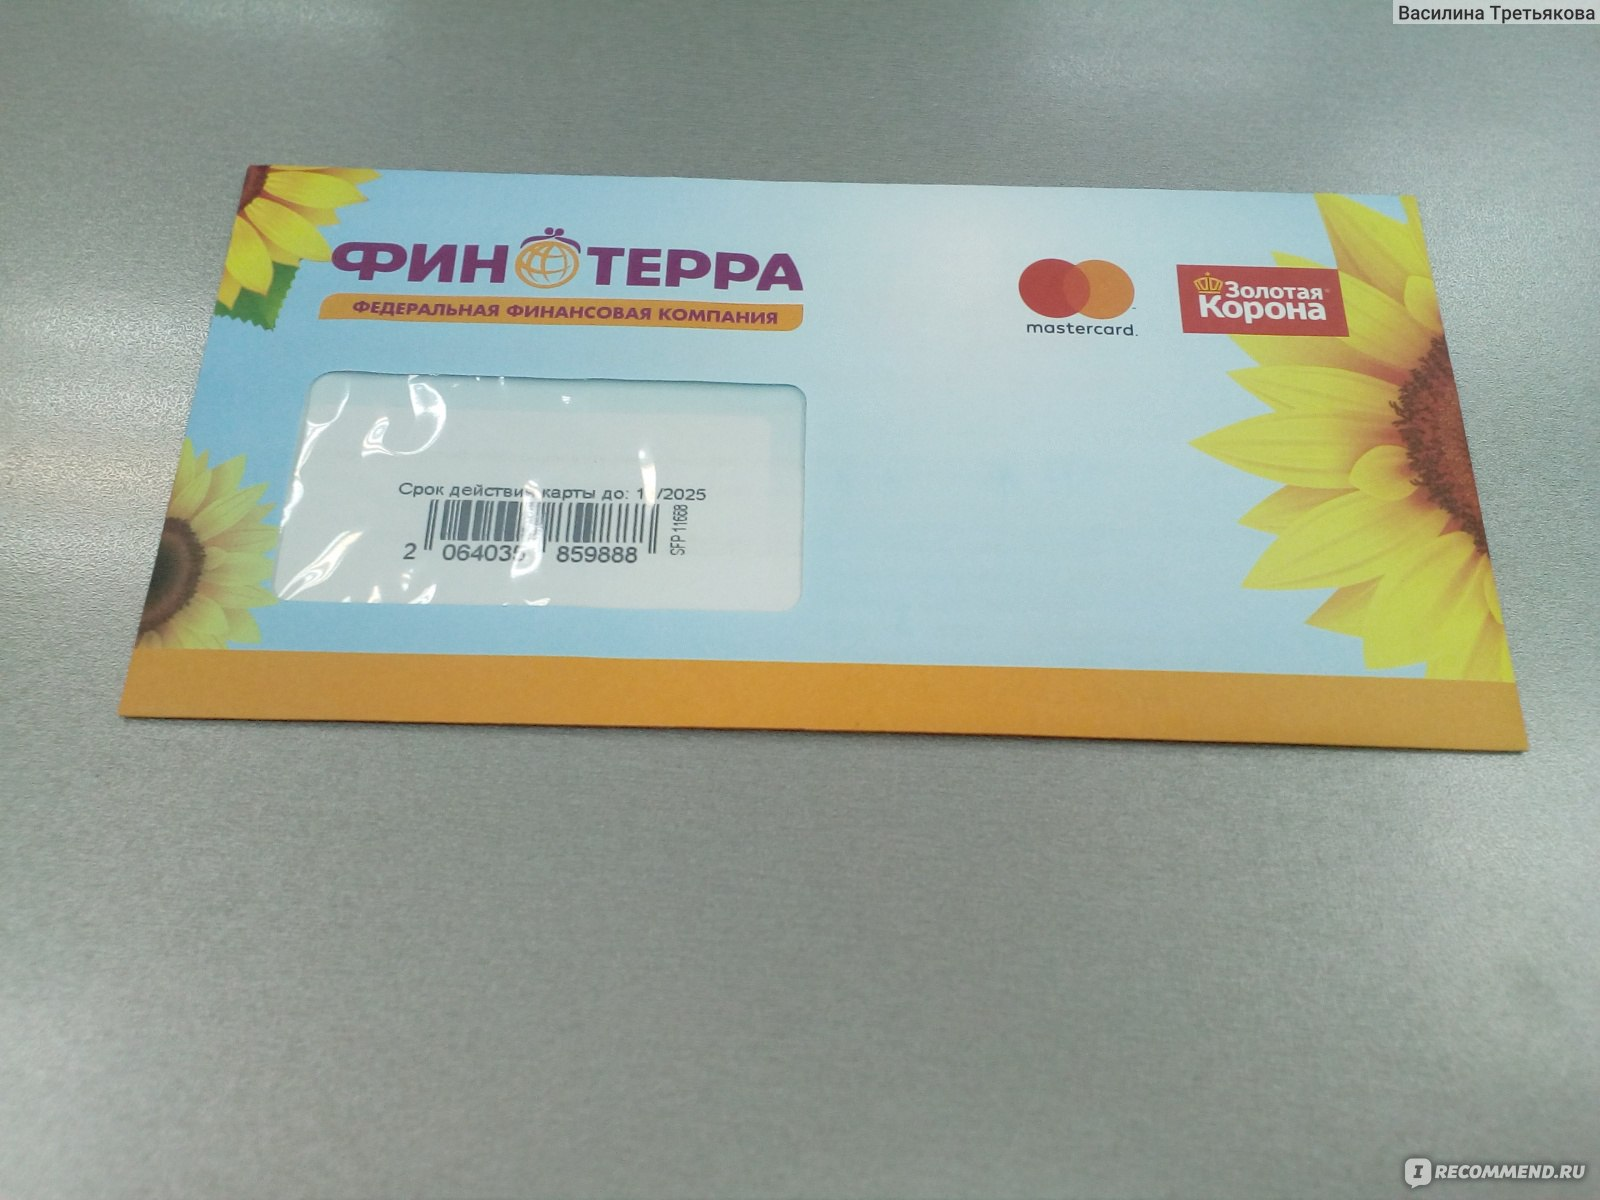 оформить займ финтерра capital one business credit card uk login